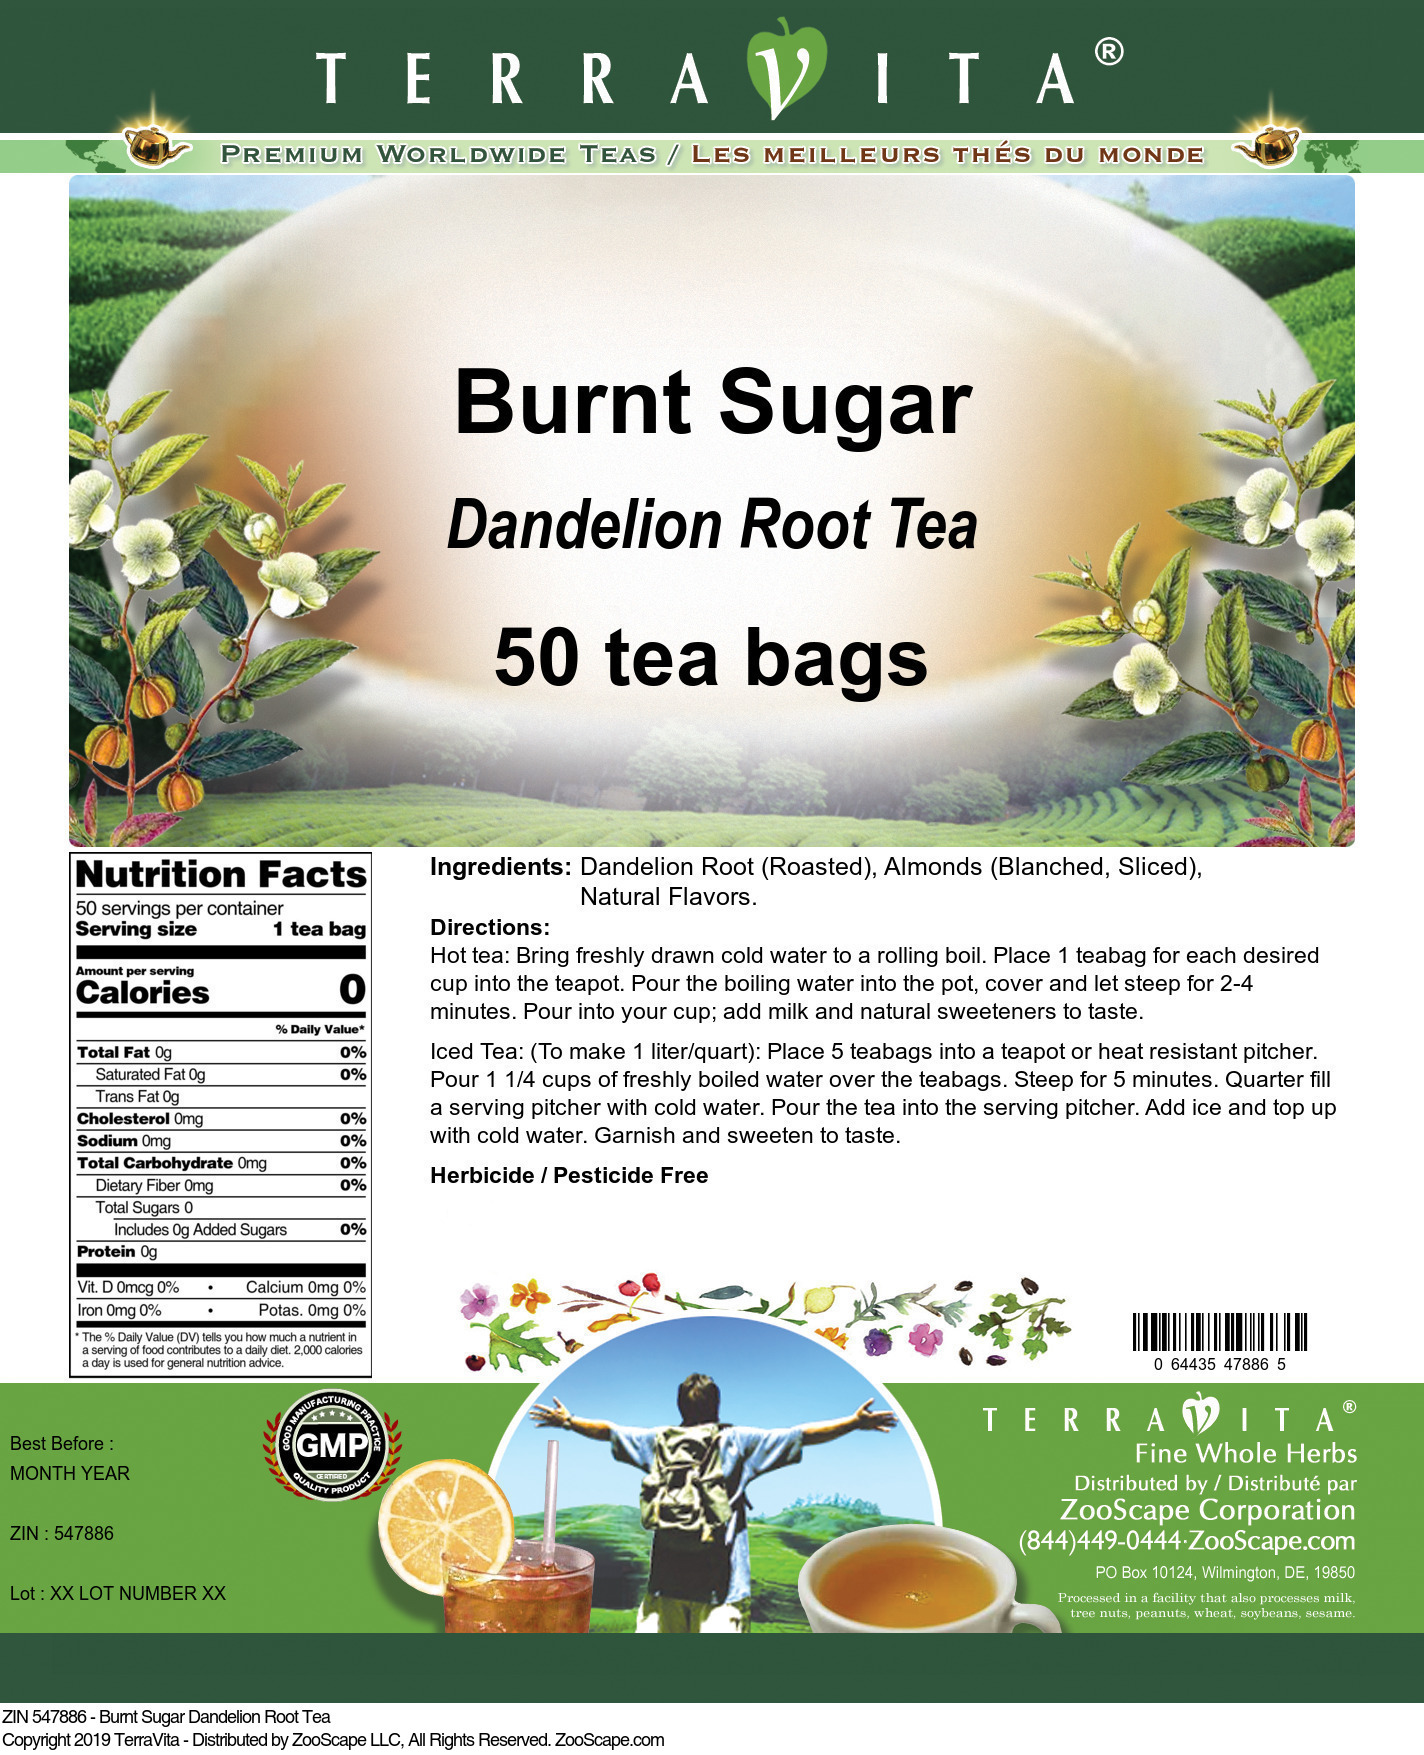 Burnt Sugar Dandelion Root